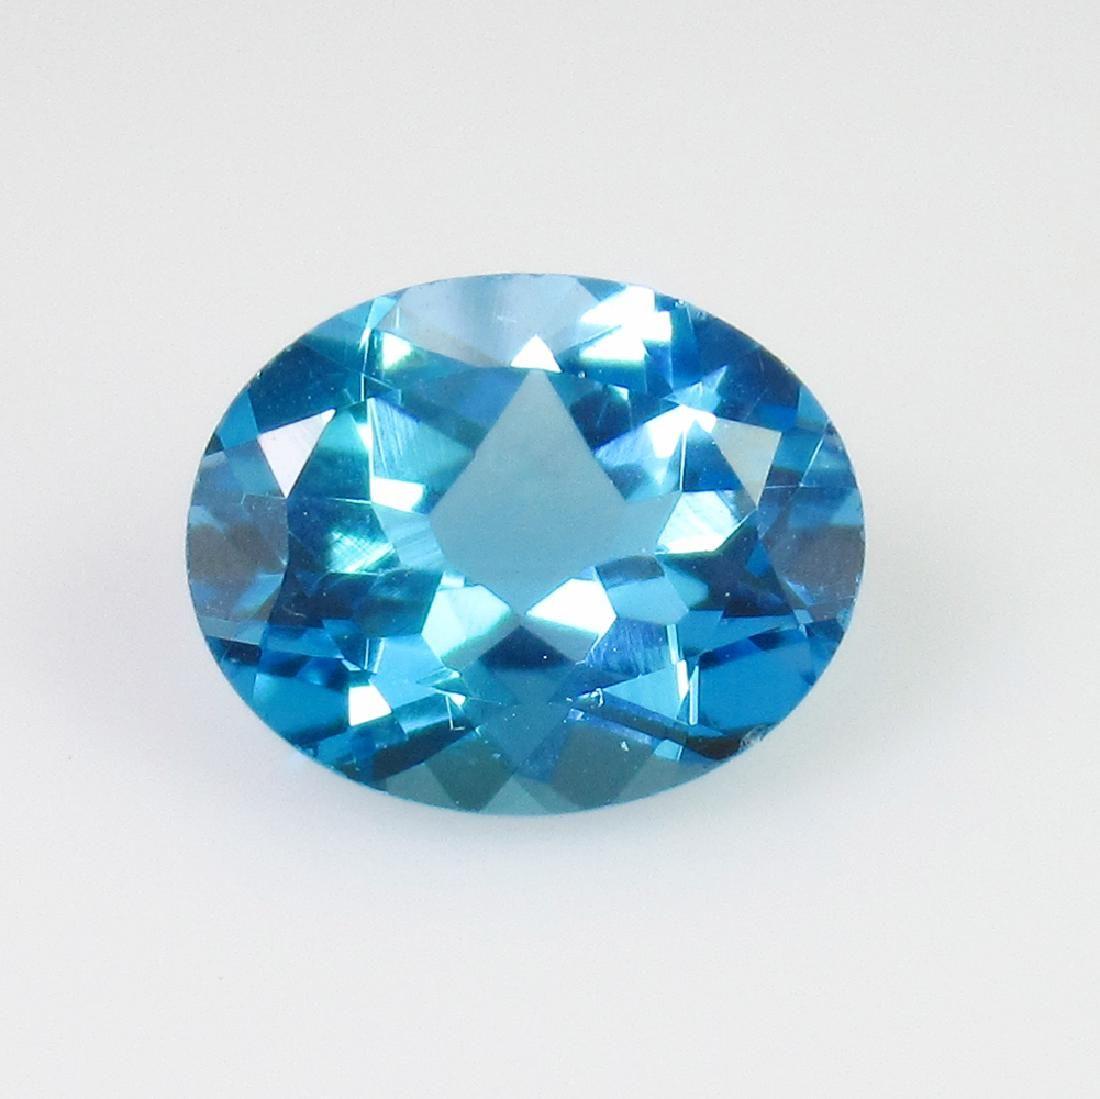 2.78 Ct Genuine Blue Topaz 10X8 mm Oval Cut